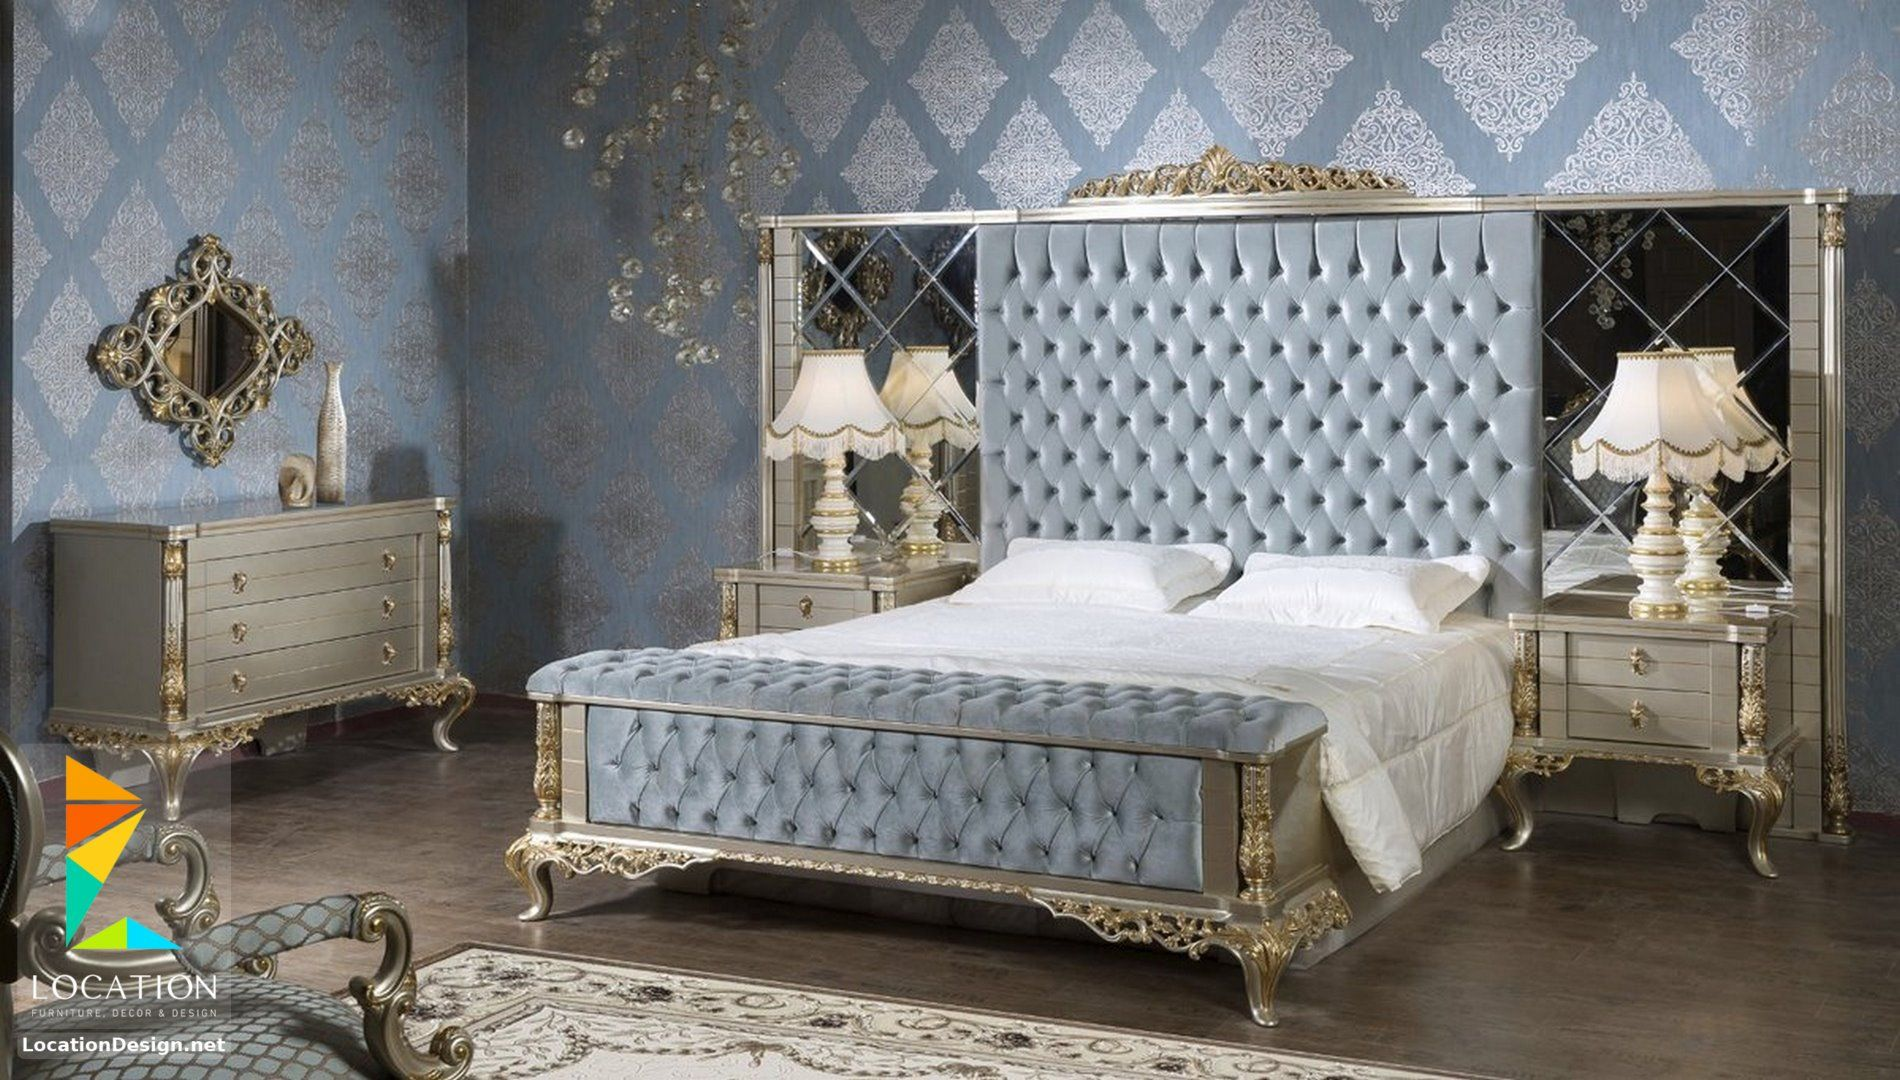 احدث موديلات و اشكال غرف نوم تركي 2019 2020 King Bedroom Furniture Luxurious Bedrooms Classic Bedroom